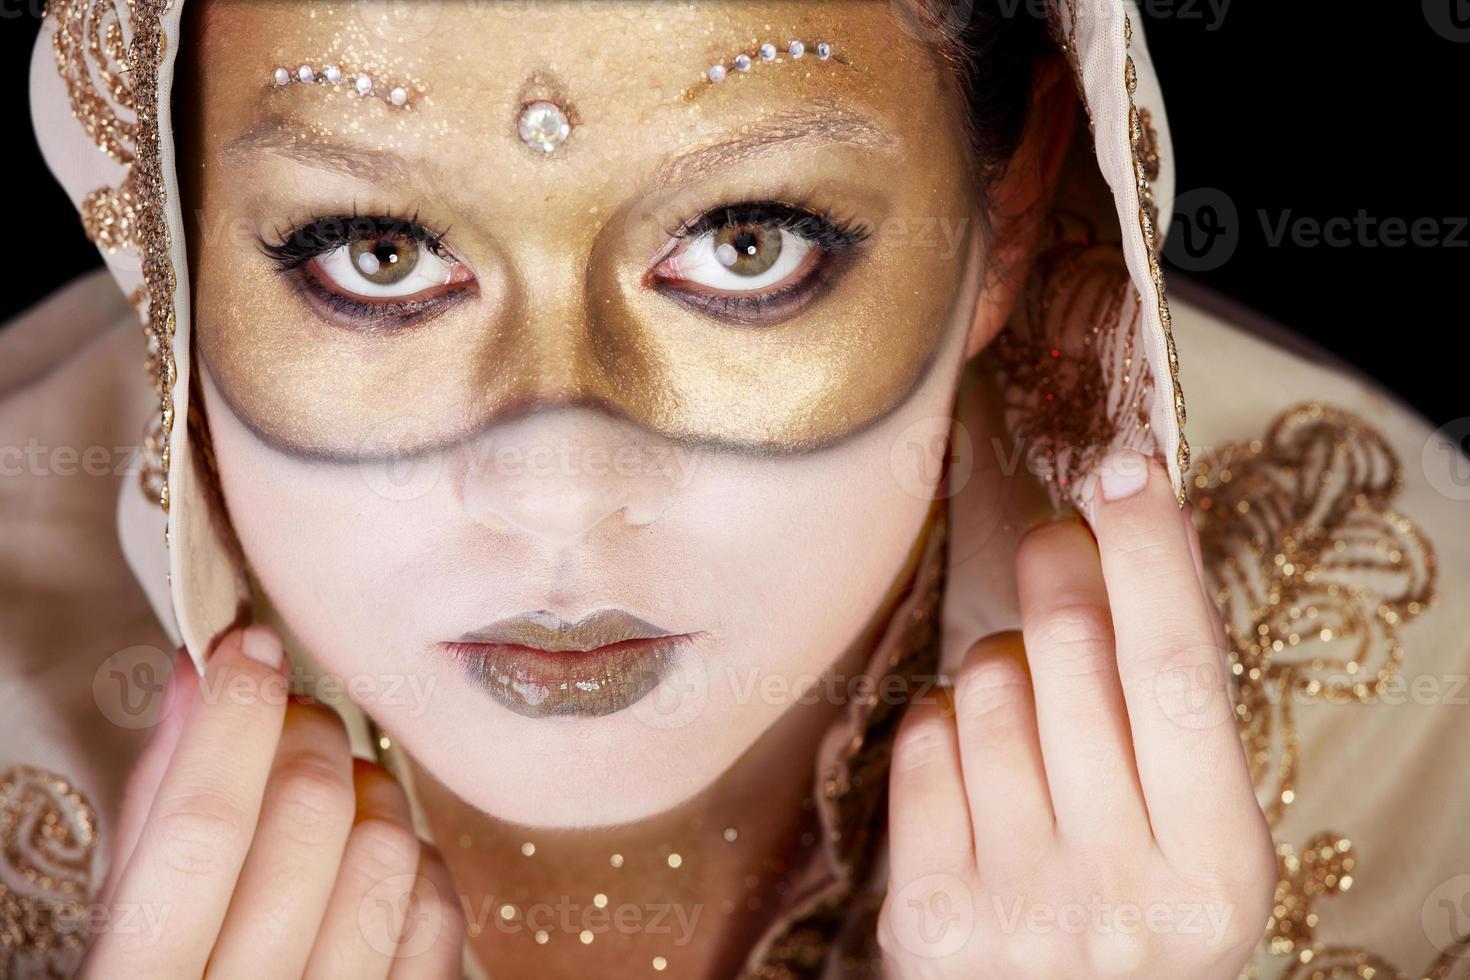 mooie jonge vrouw in carnaval masker foto